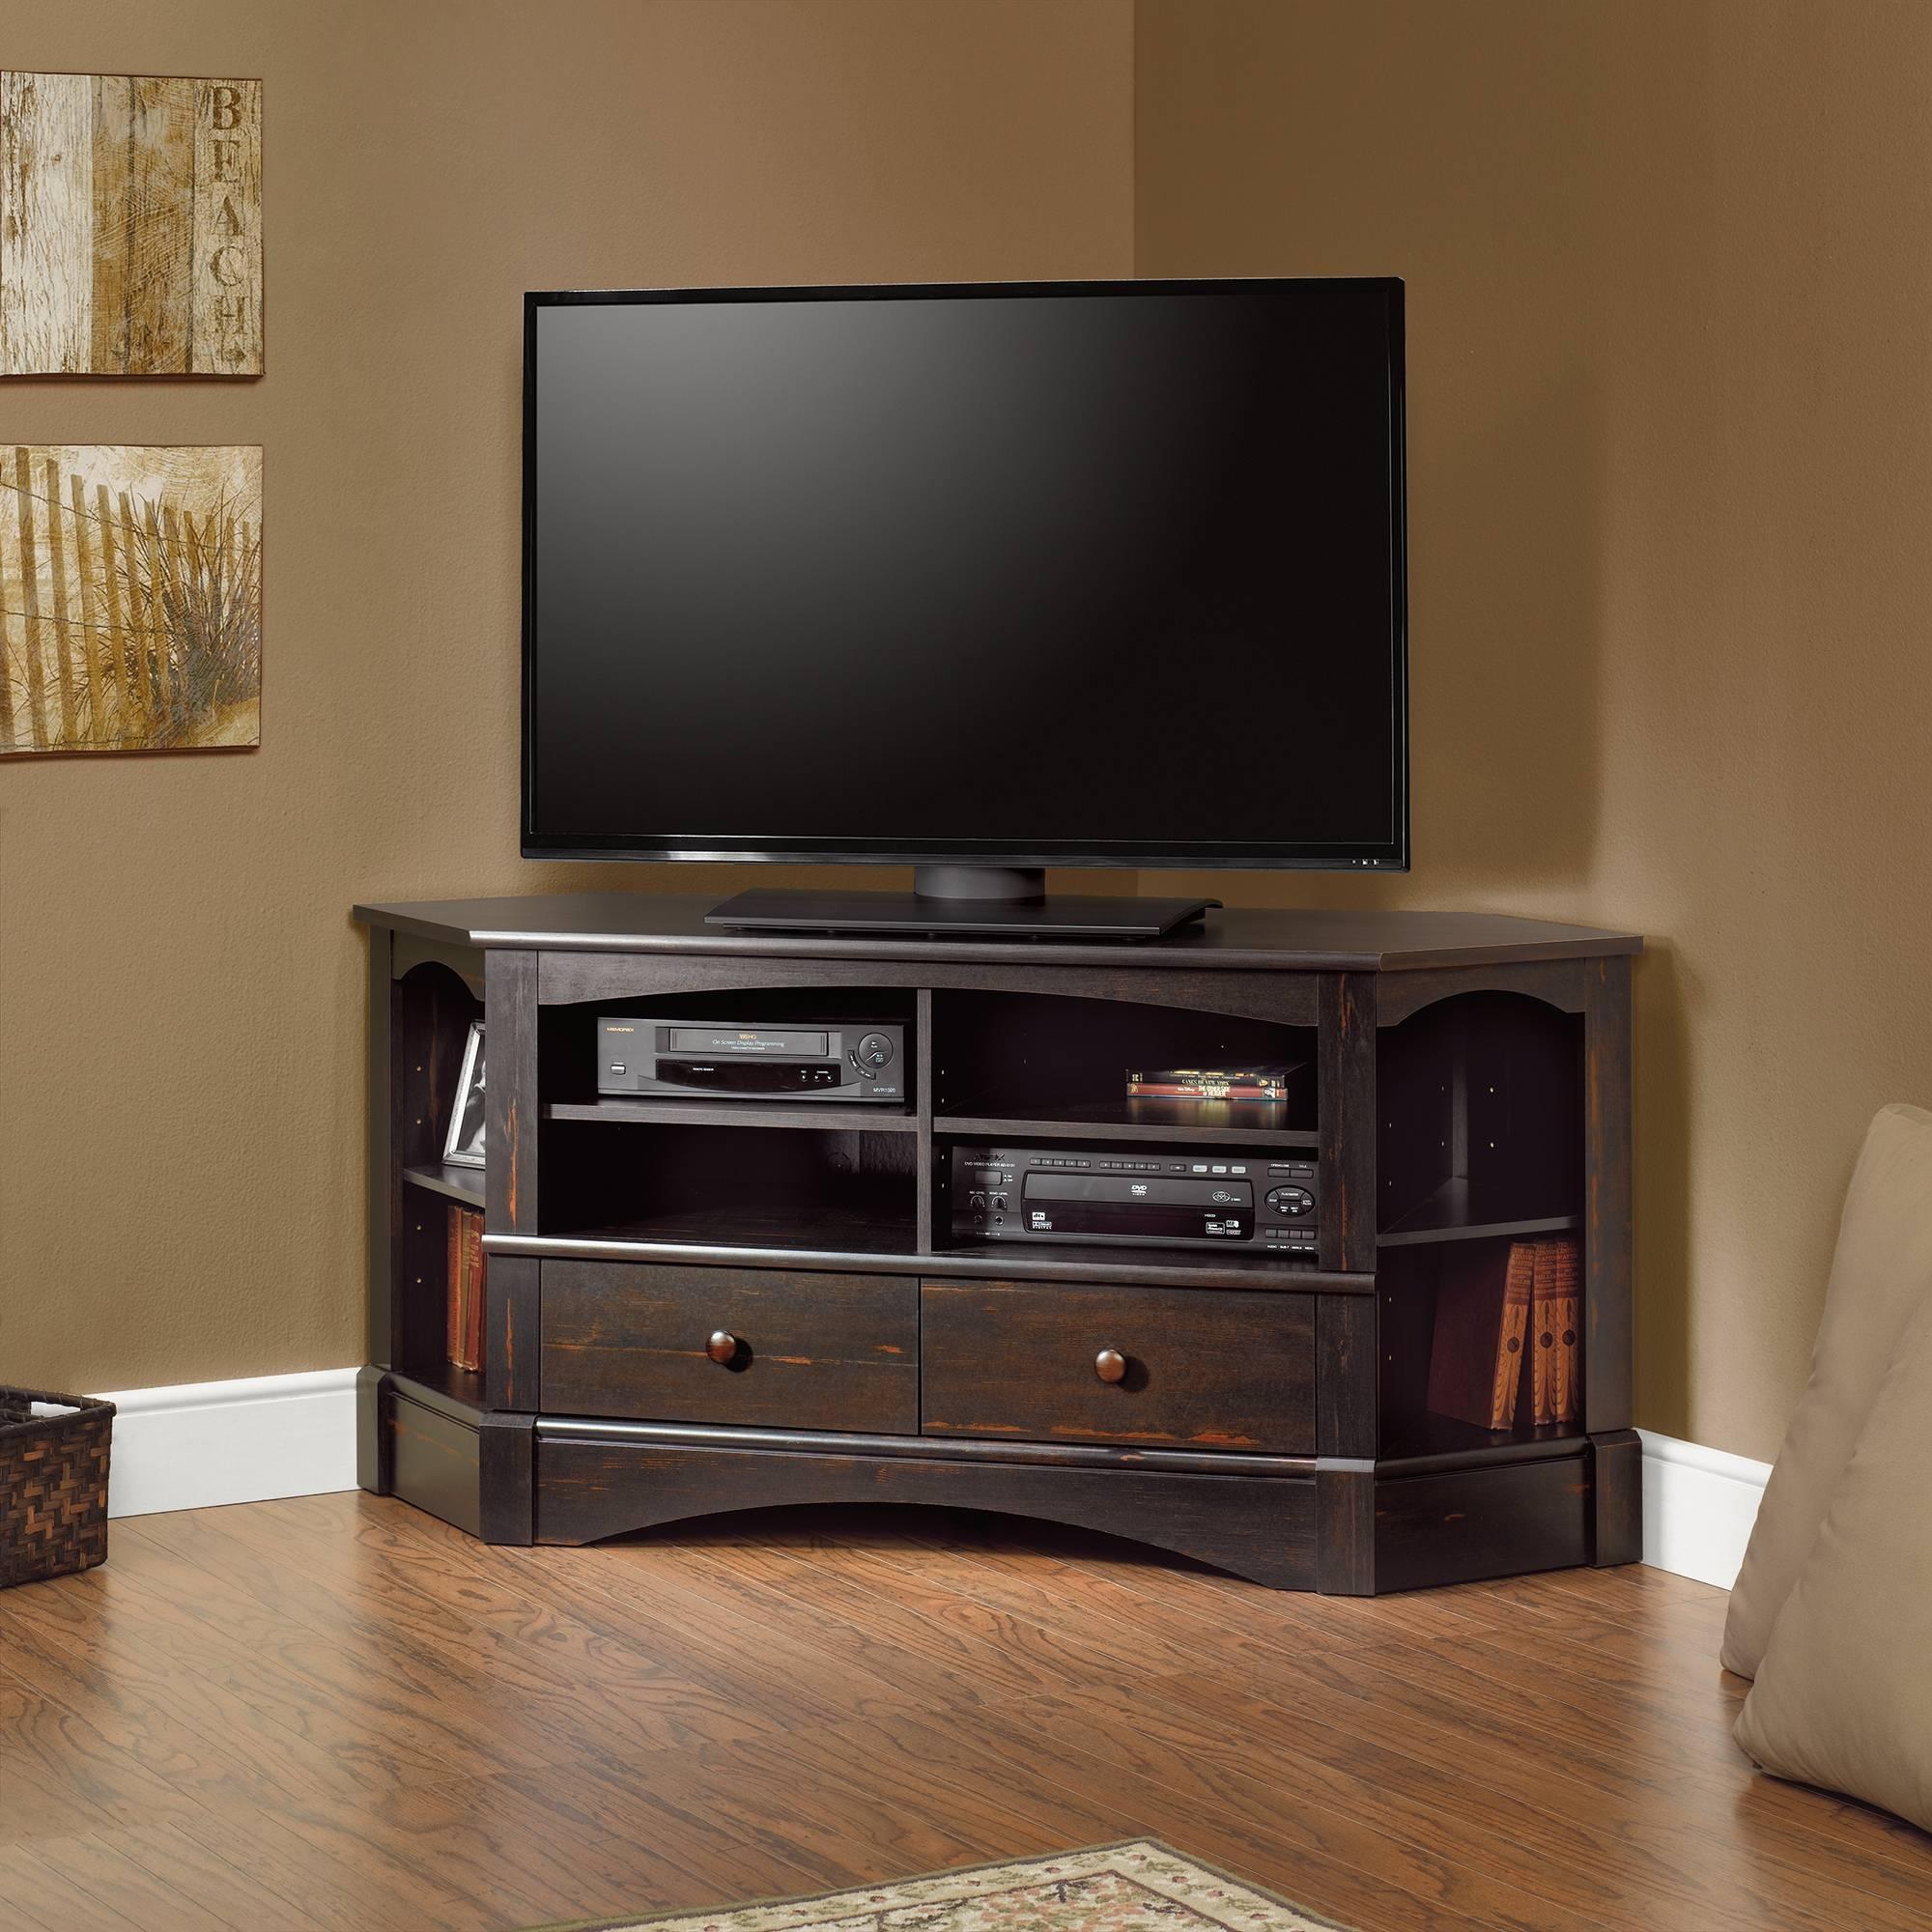 Harbor View | Corner Entertainment Credenza | 402902 | Sauder In Wood Corner Tv Cabinets (View 9 of 15)